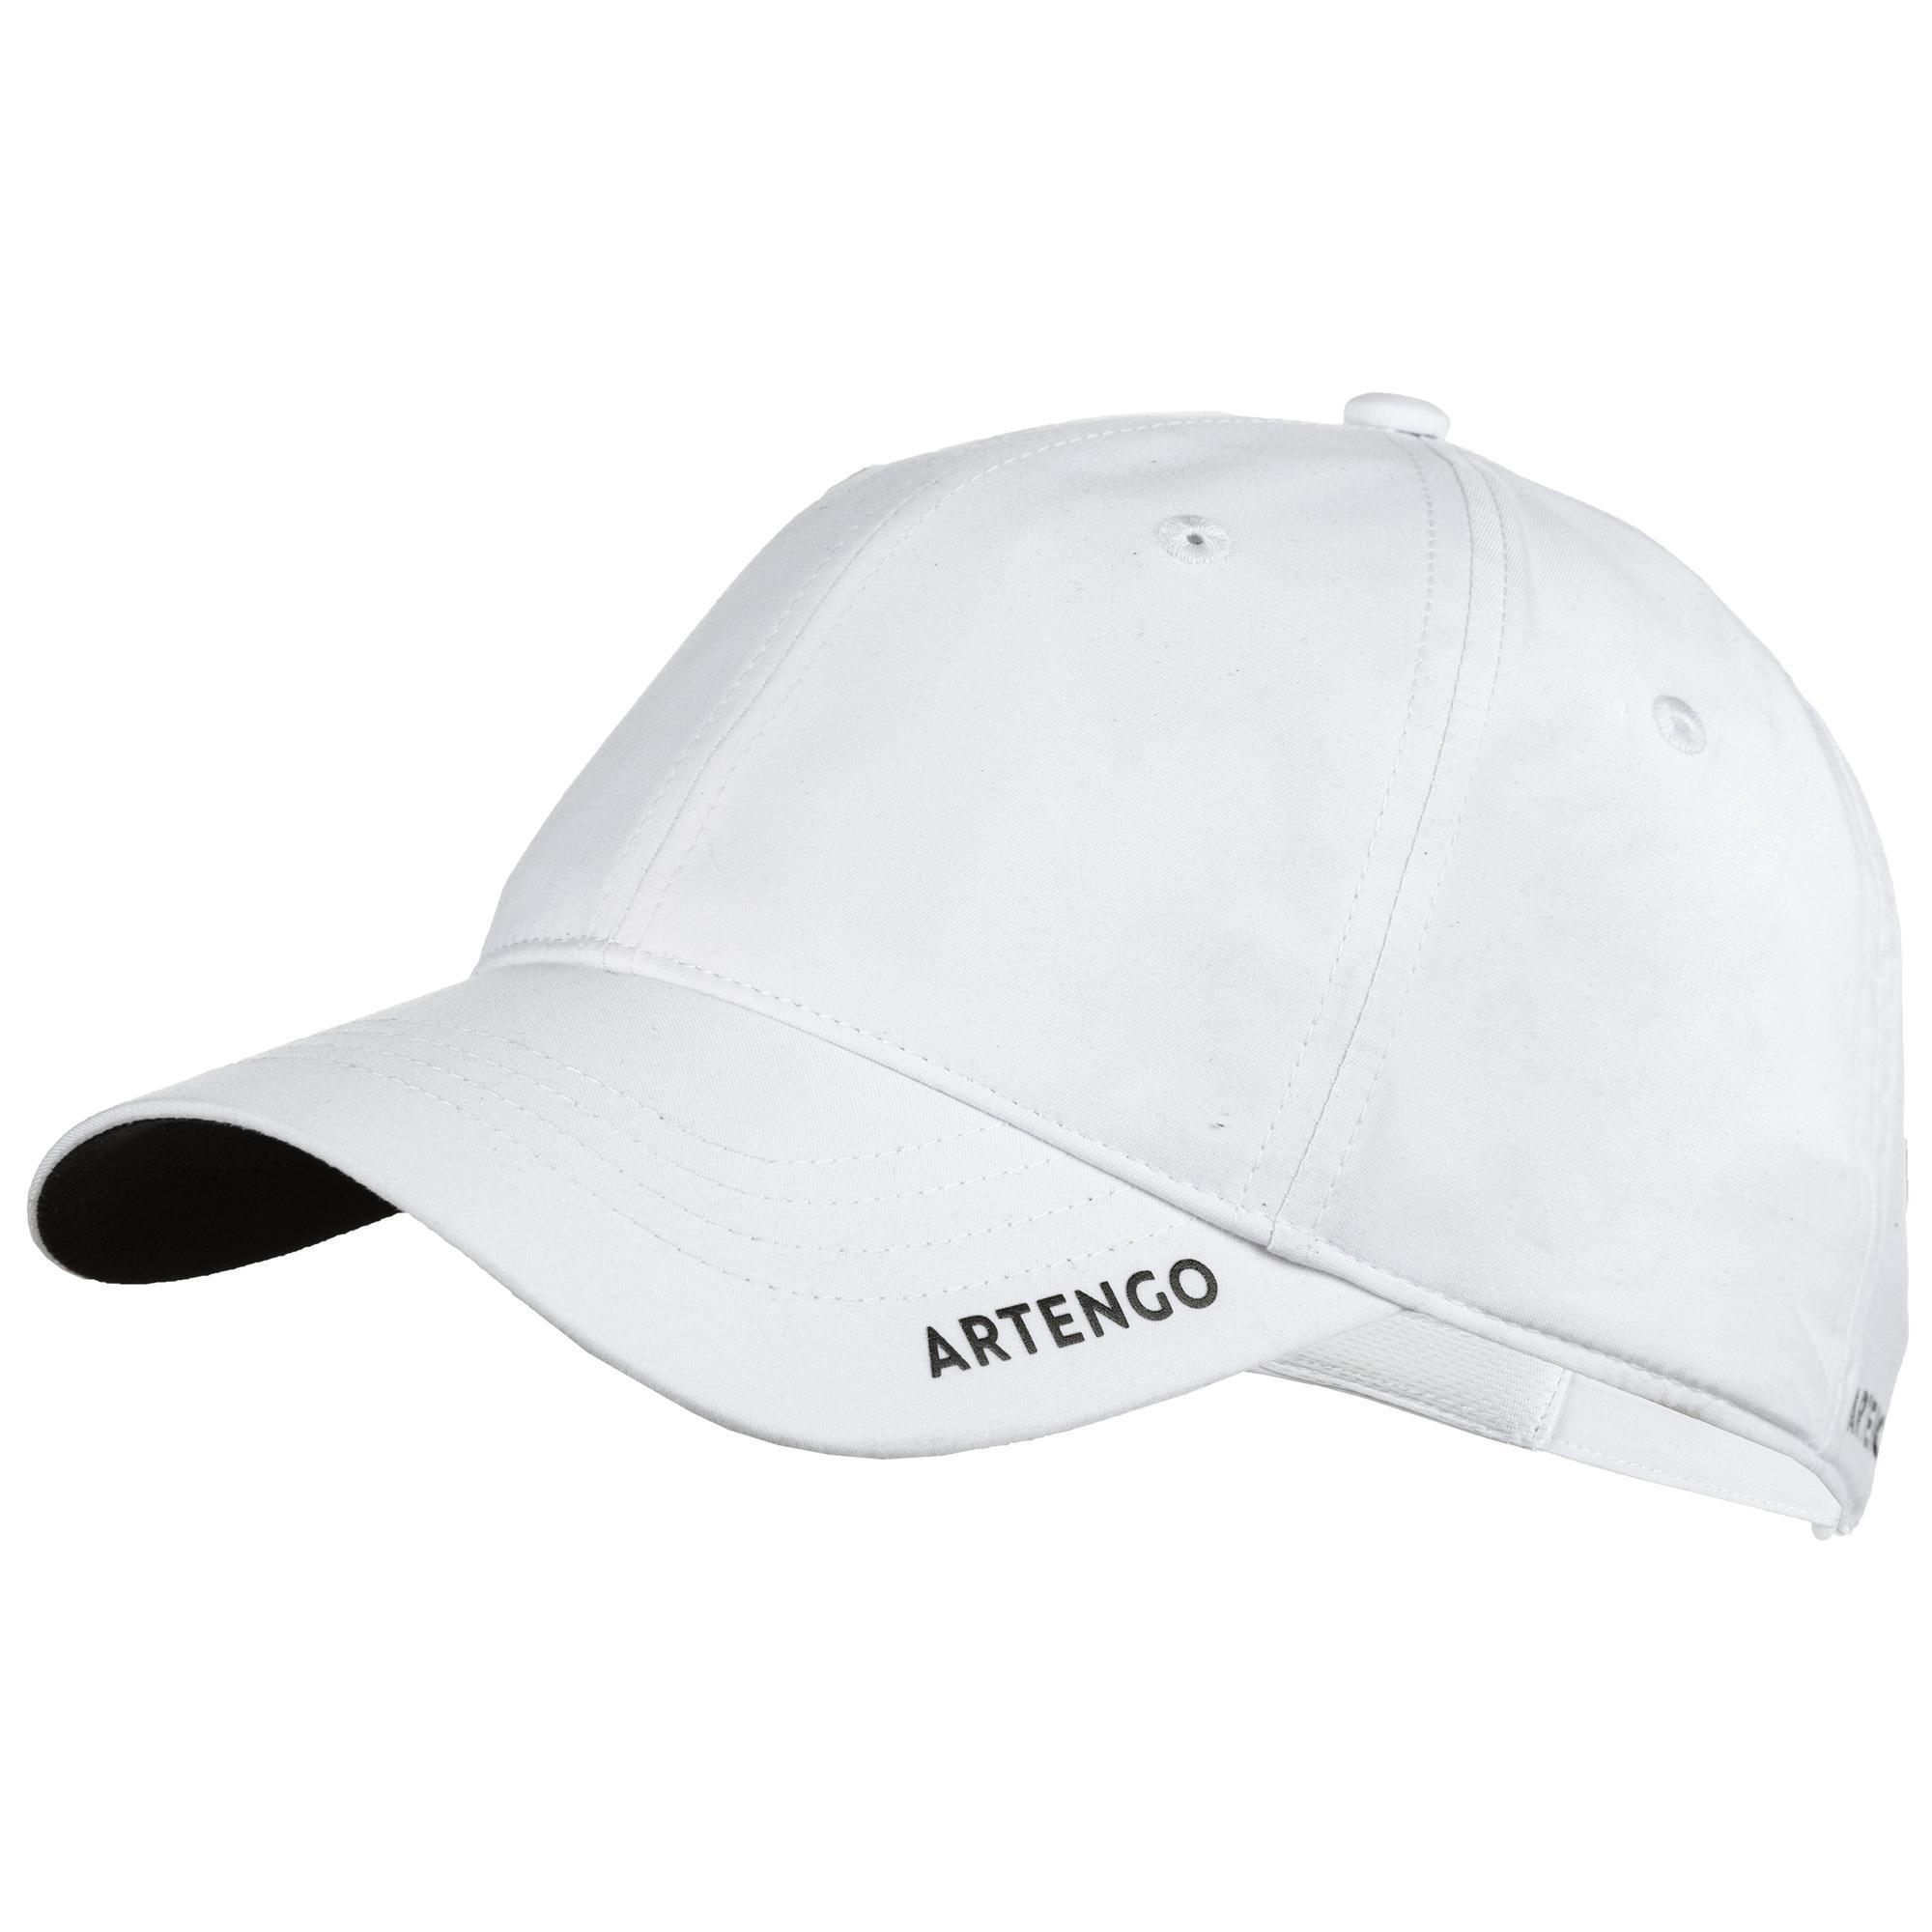 Schirmmütze TC 500 Tennis-Cap flexibel weiß | Accessoires > Caps > Sonstige Caps | Weiß - Schwarz | Artengo